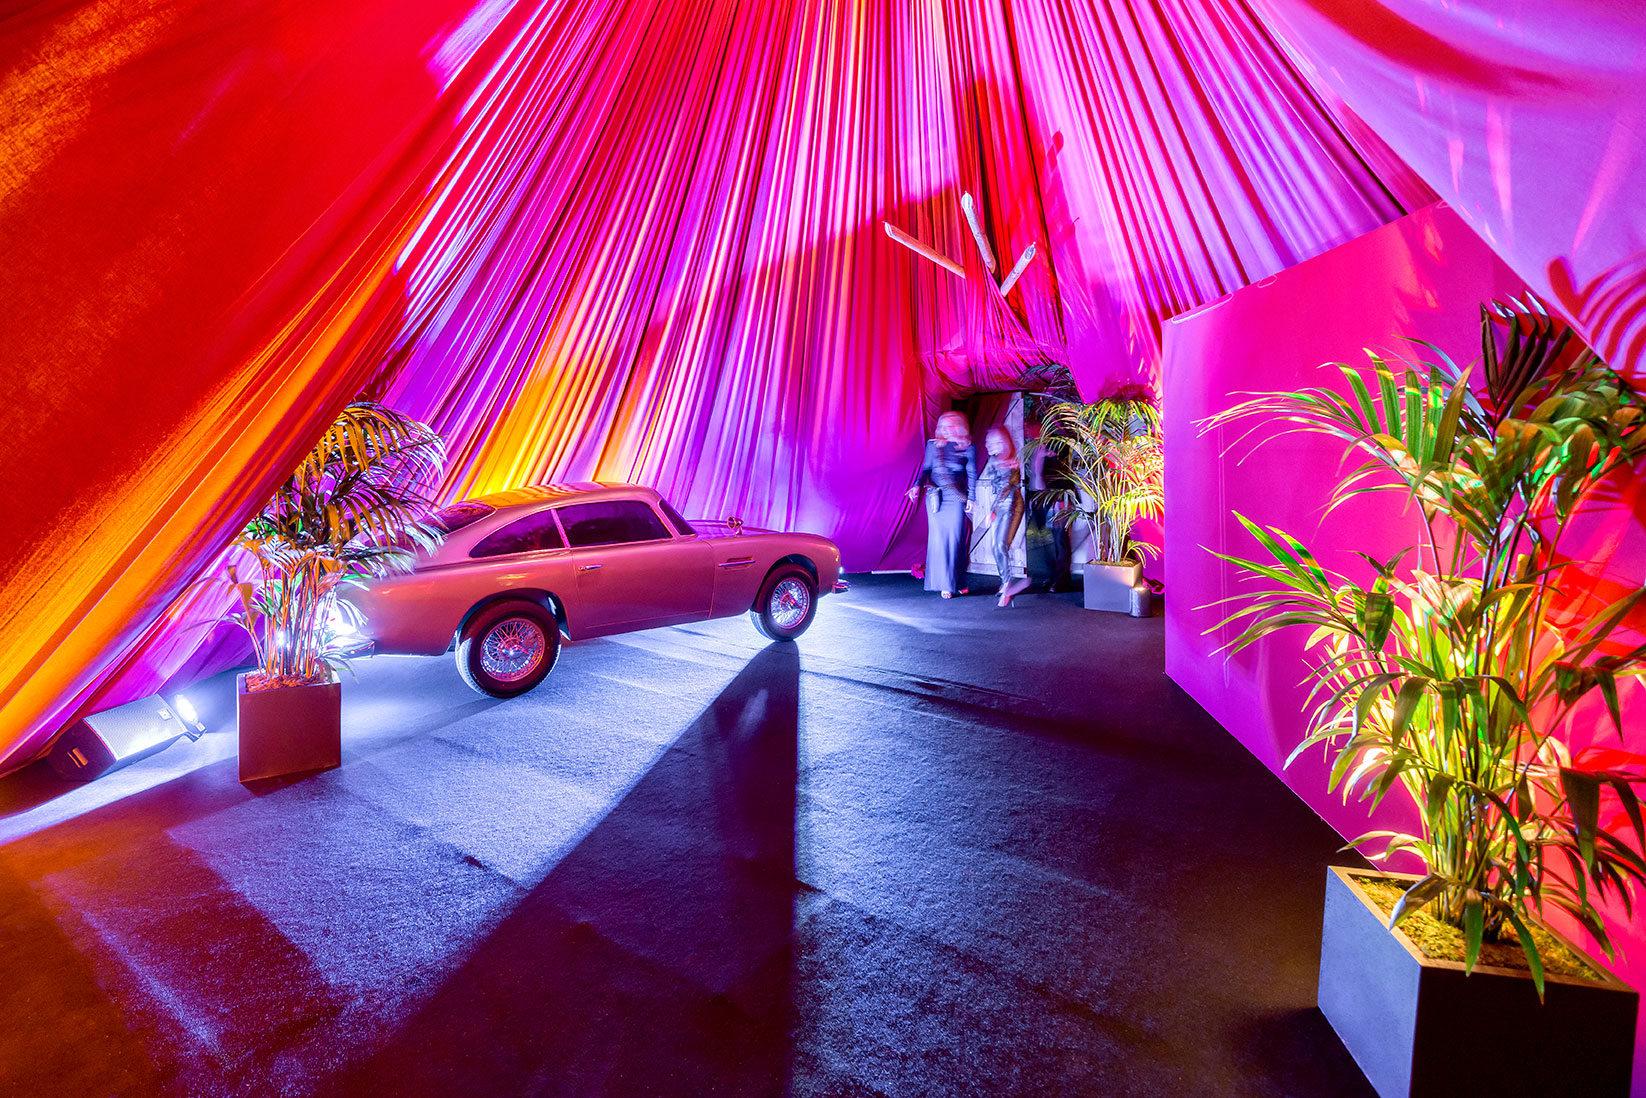 blofeld�s lair � sophisticated bondthemed 50th birthday